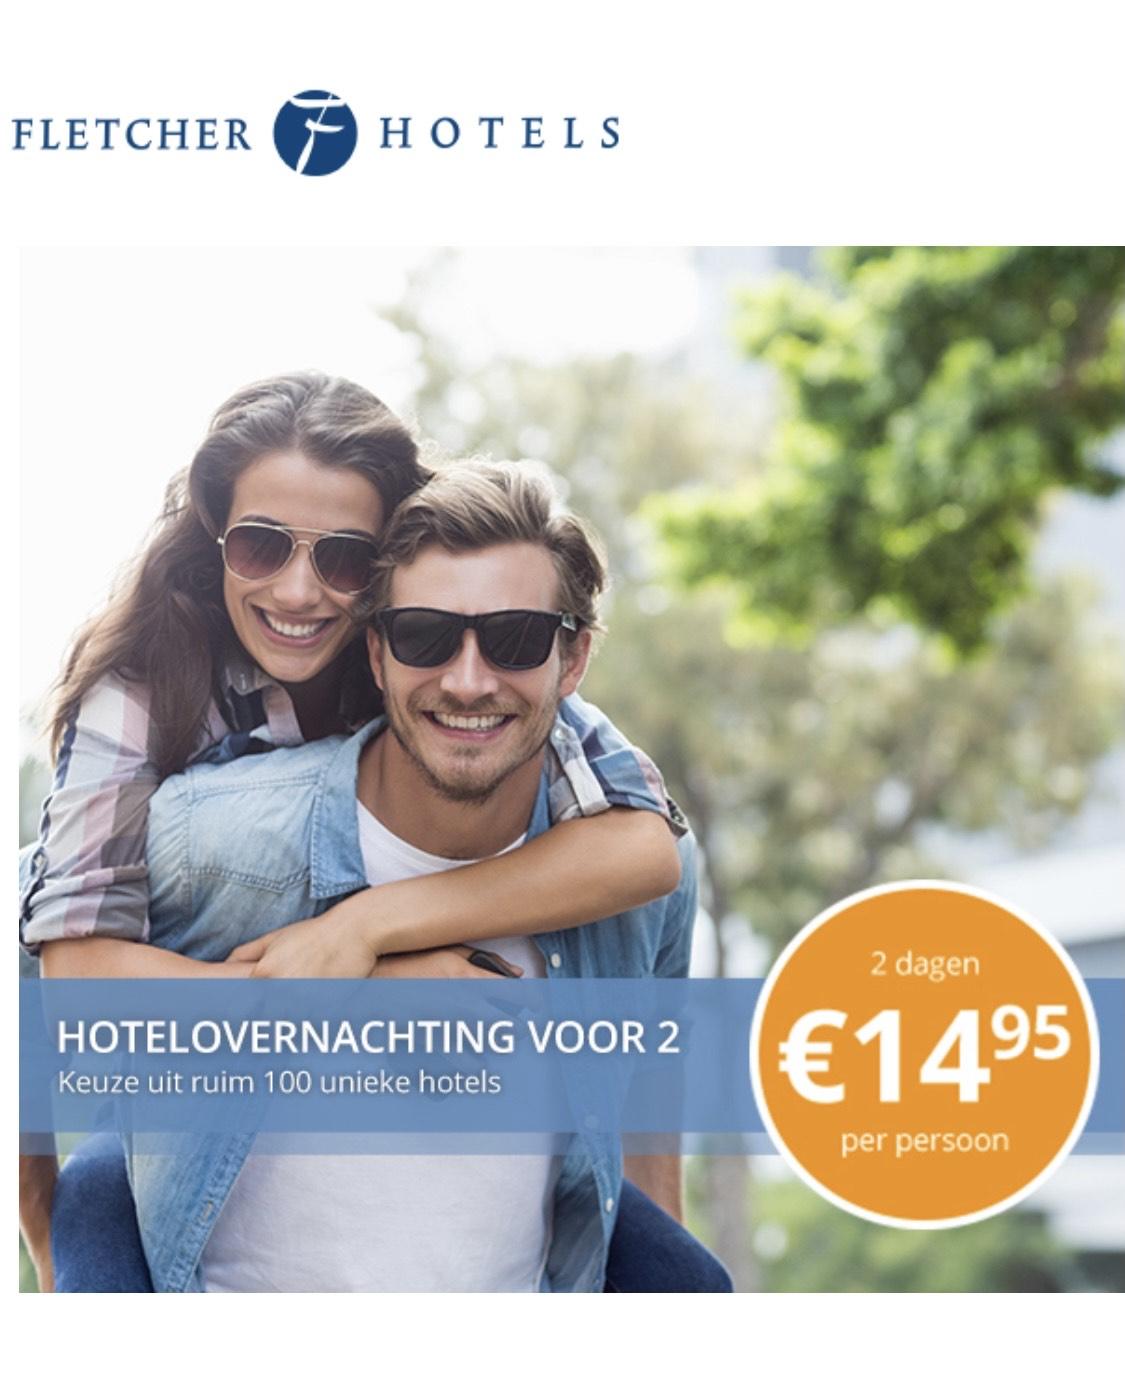 Hotelovernachting Fletcher €14,95 p.p.